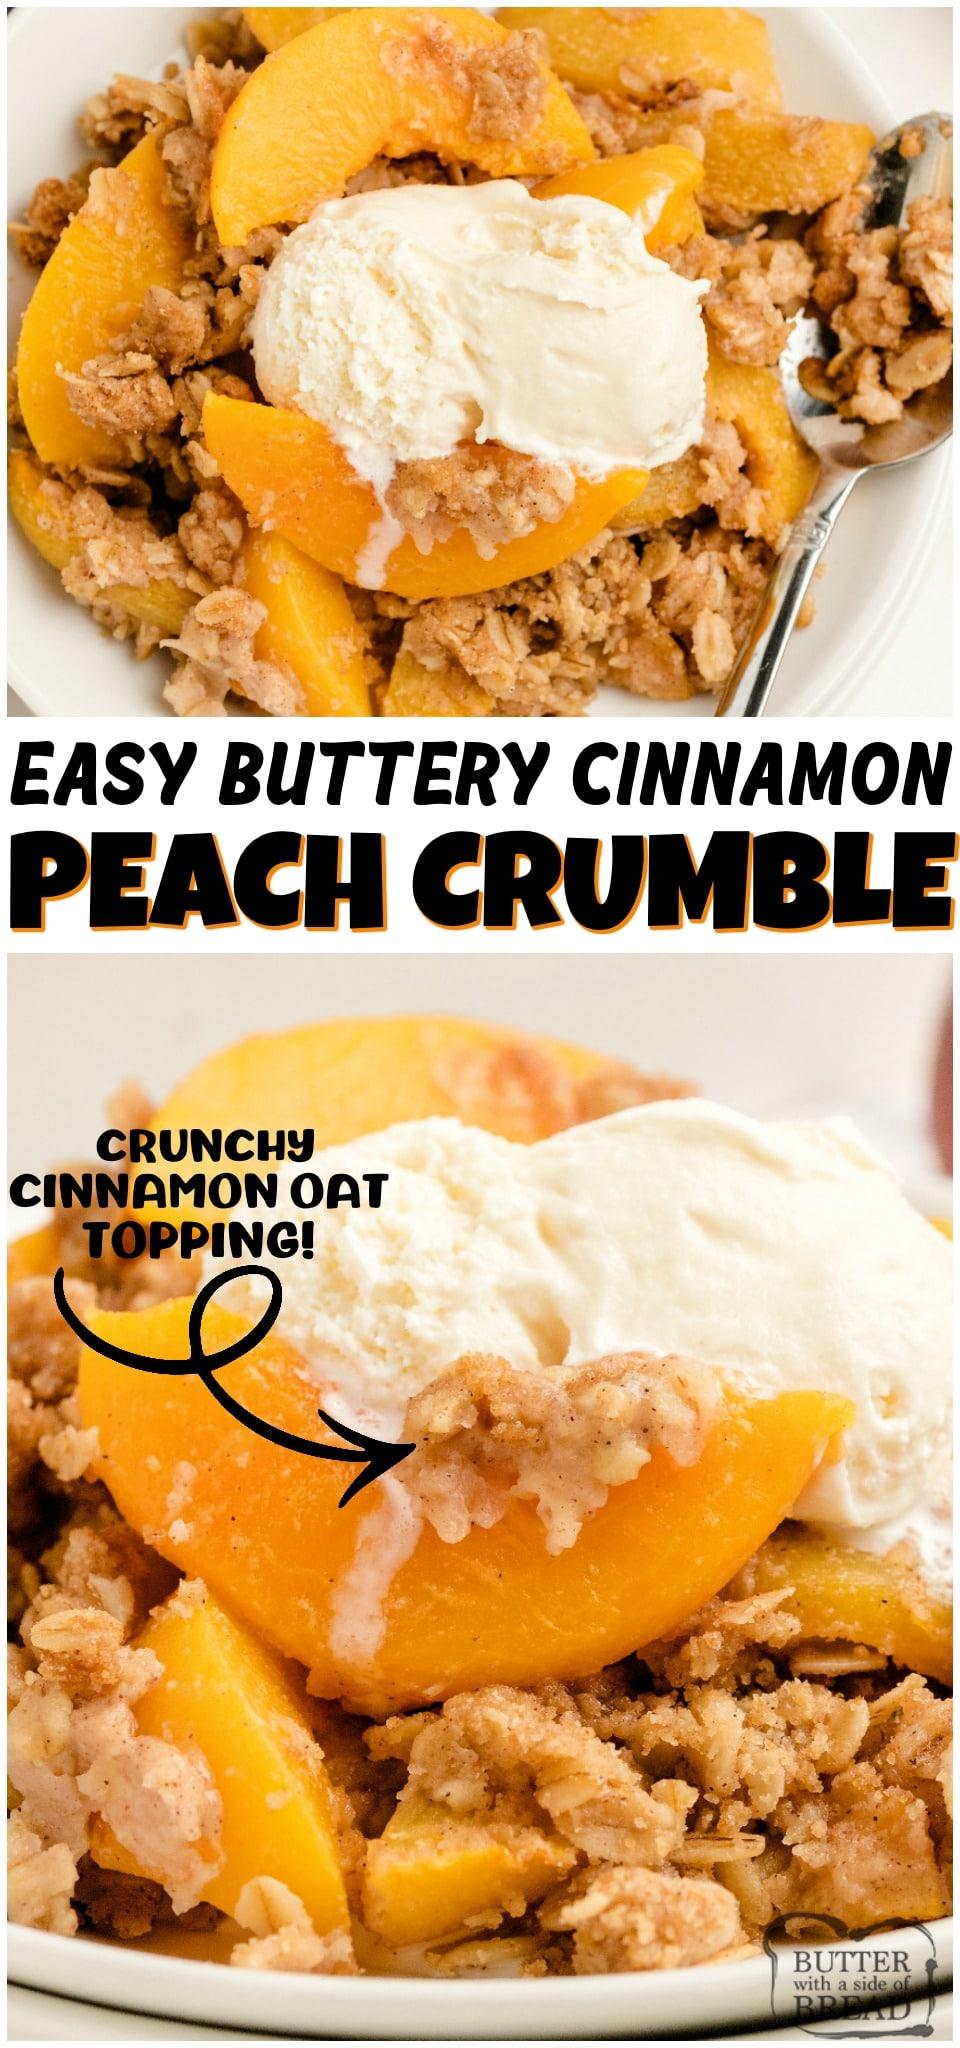 Peach Crumble recipe with sweet, ripe peaches, cinnamon, brown sugar & butter. Fantastic peach dessert recipe with fresh fruit that's super simple to make! #peach #peaches #cobbler #crisp #crumble #baking #dessert #butter #recipe from BUTTER WITH A SIDE OF BREAD